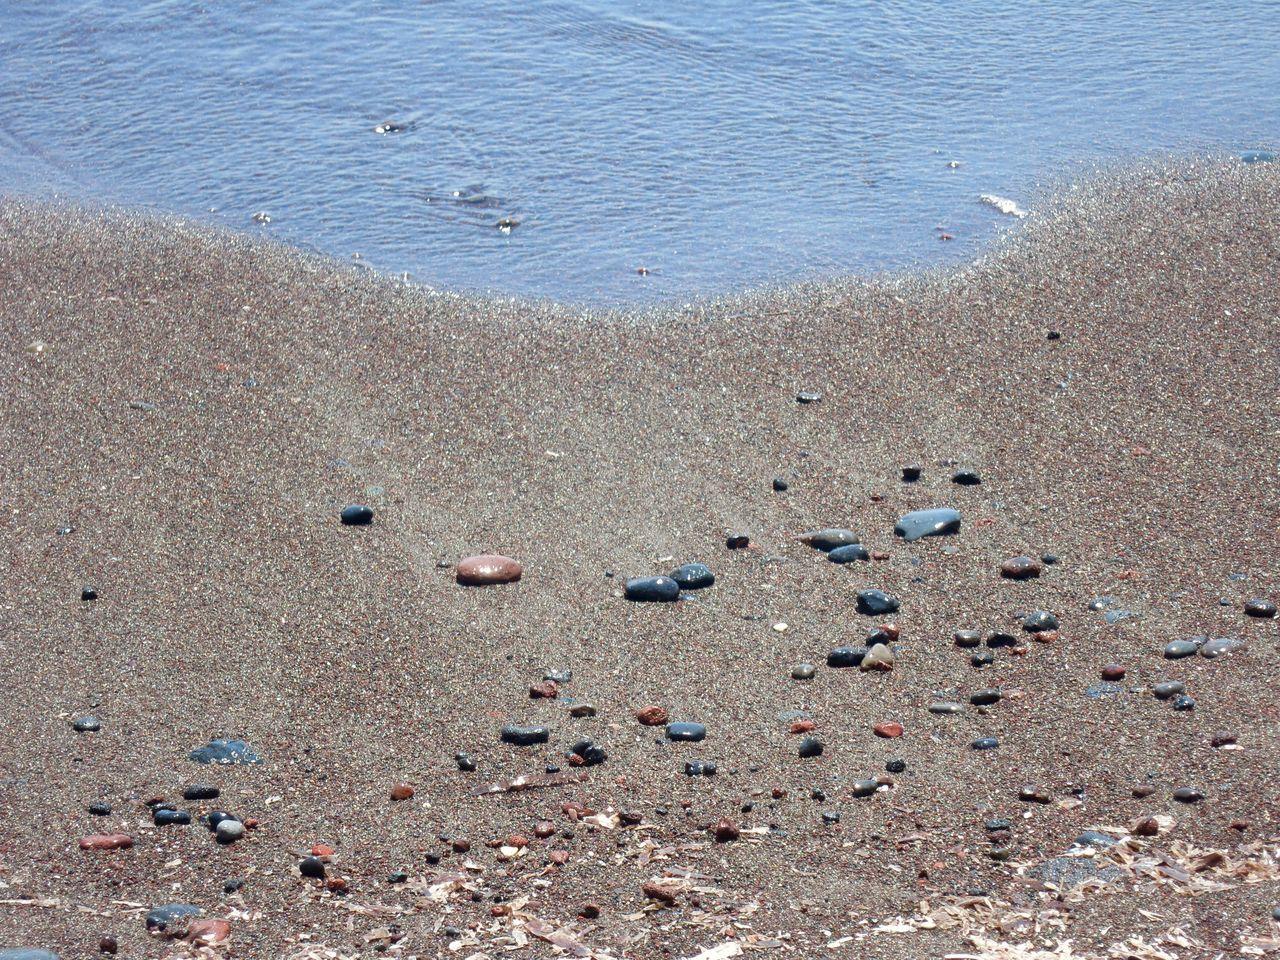 Beach Beauty In Nature Coastline Idyllic Nature Pebble Pebbles Sand Sea Shore Water The Essence Of Summer Sunlight Sunny